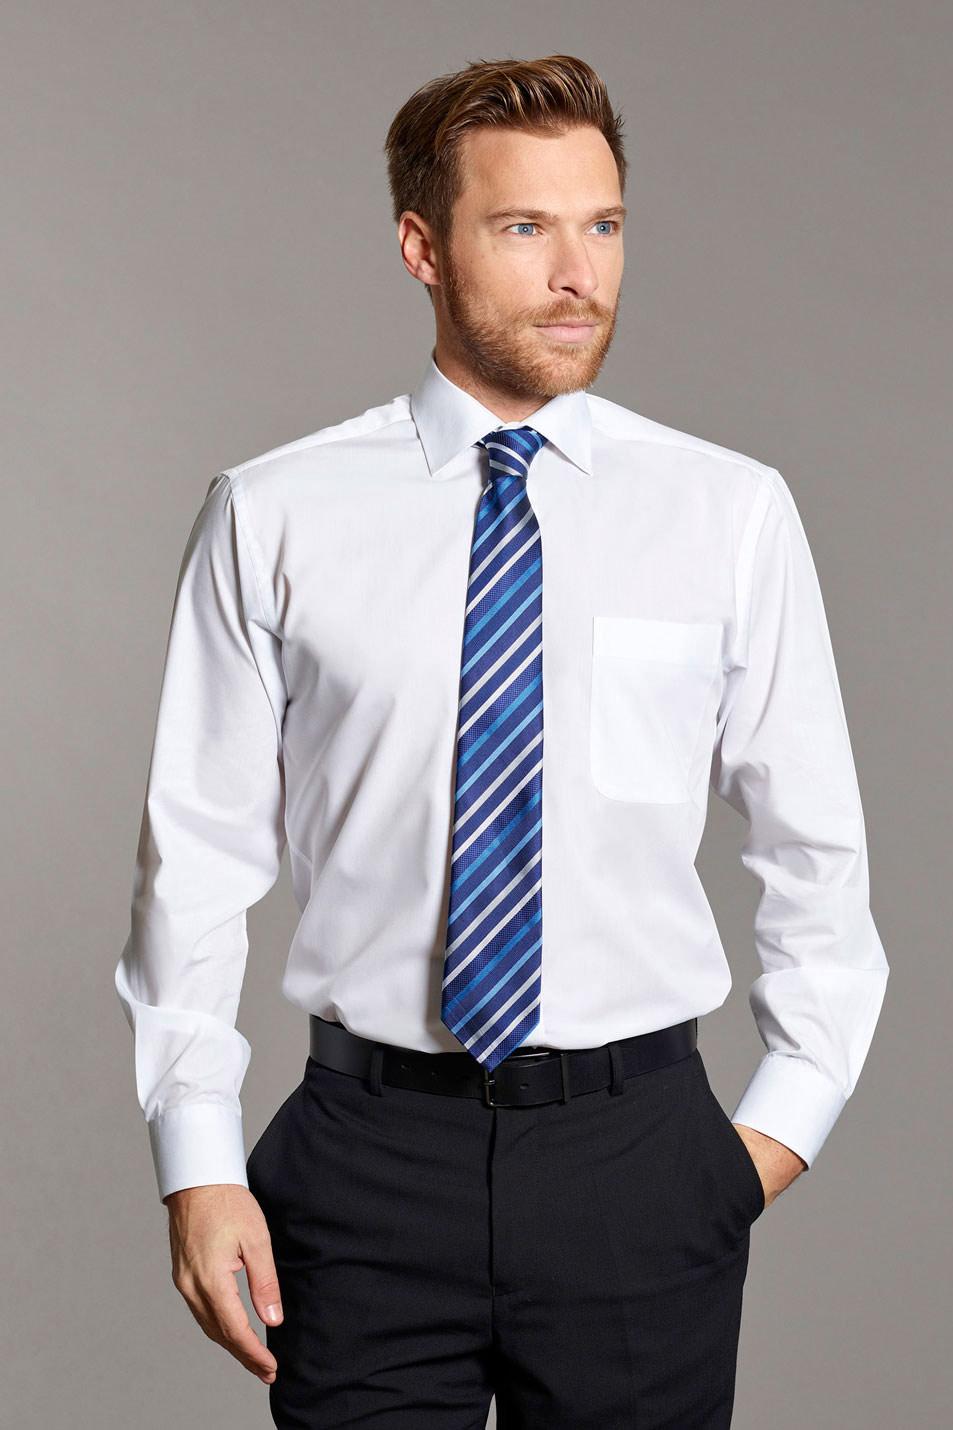 Disley Cutaway Collar Long Sleeve Shirt In Easycare Fabric